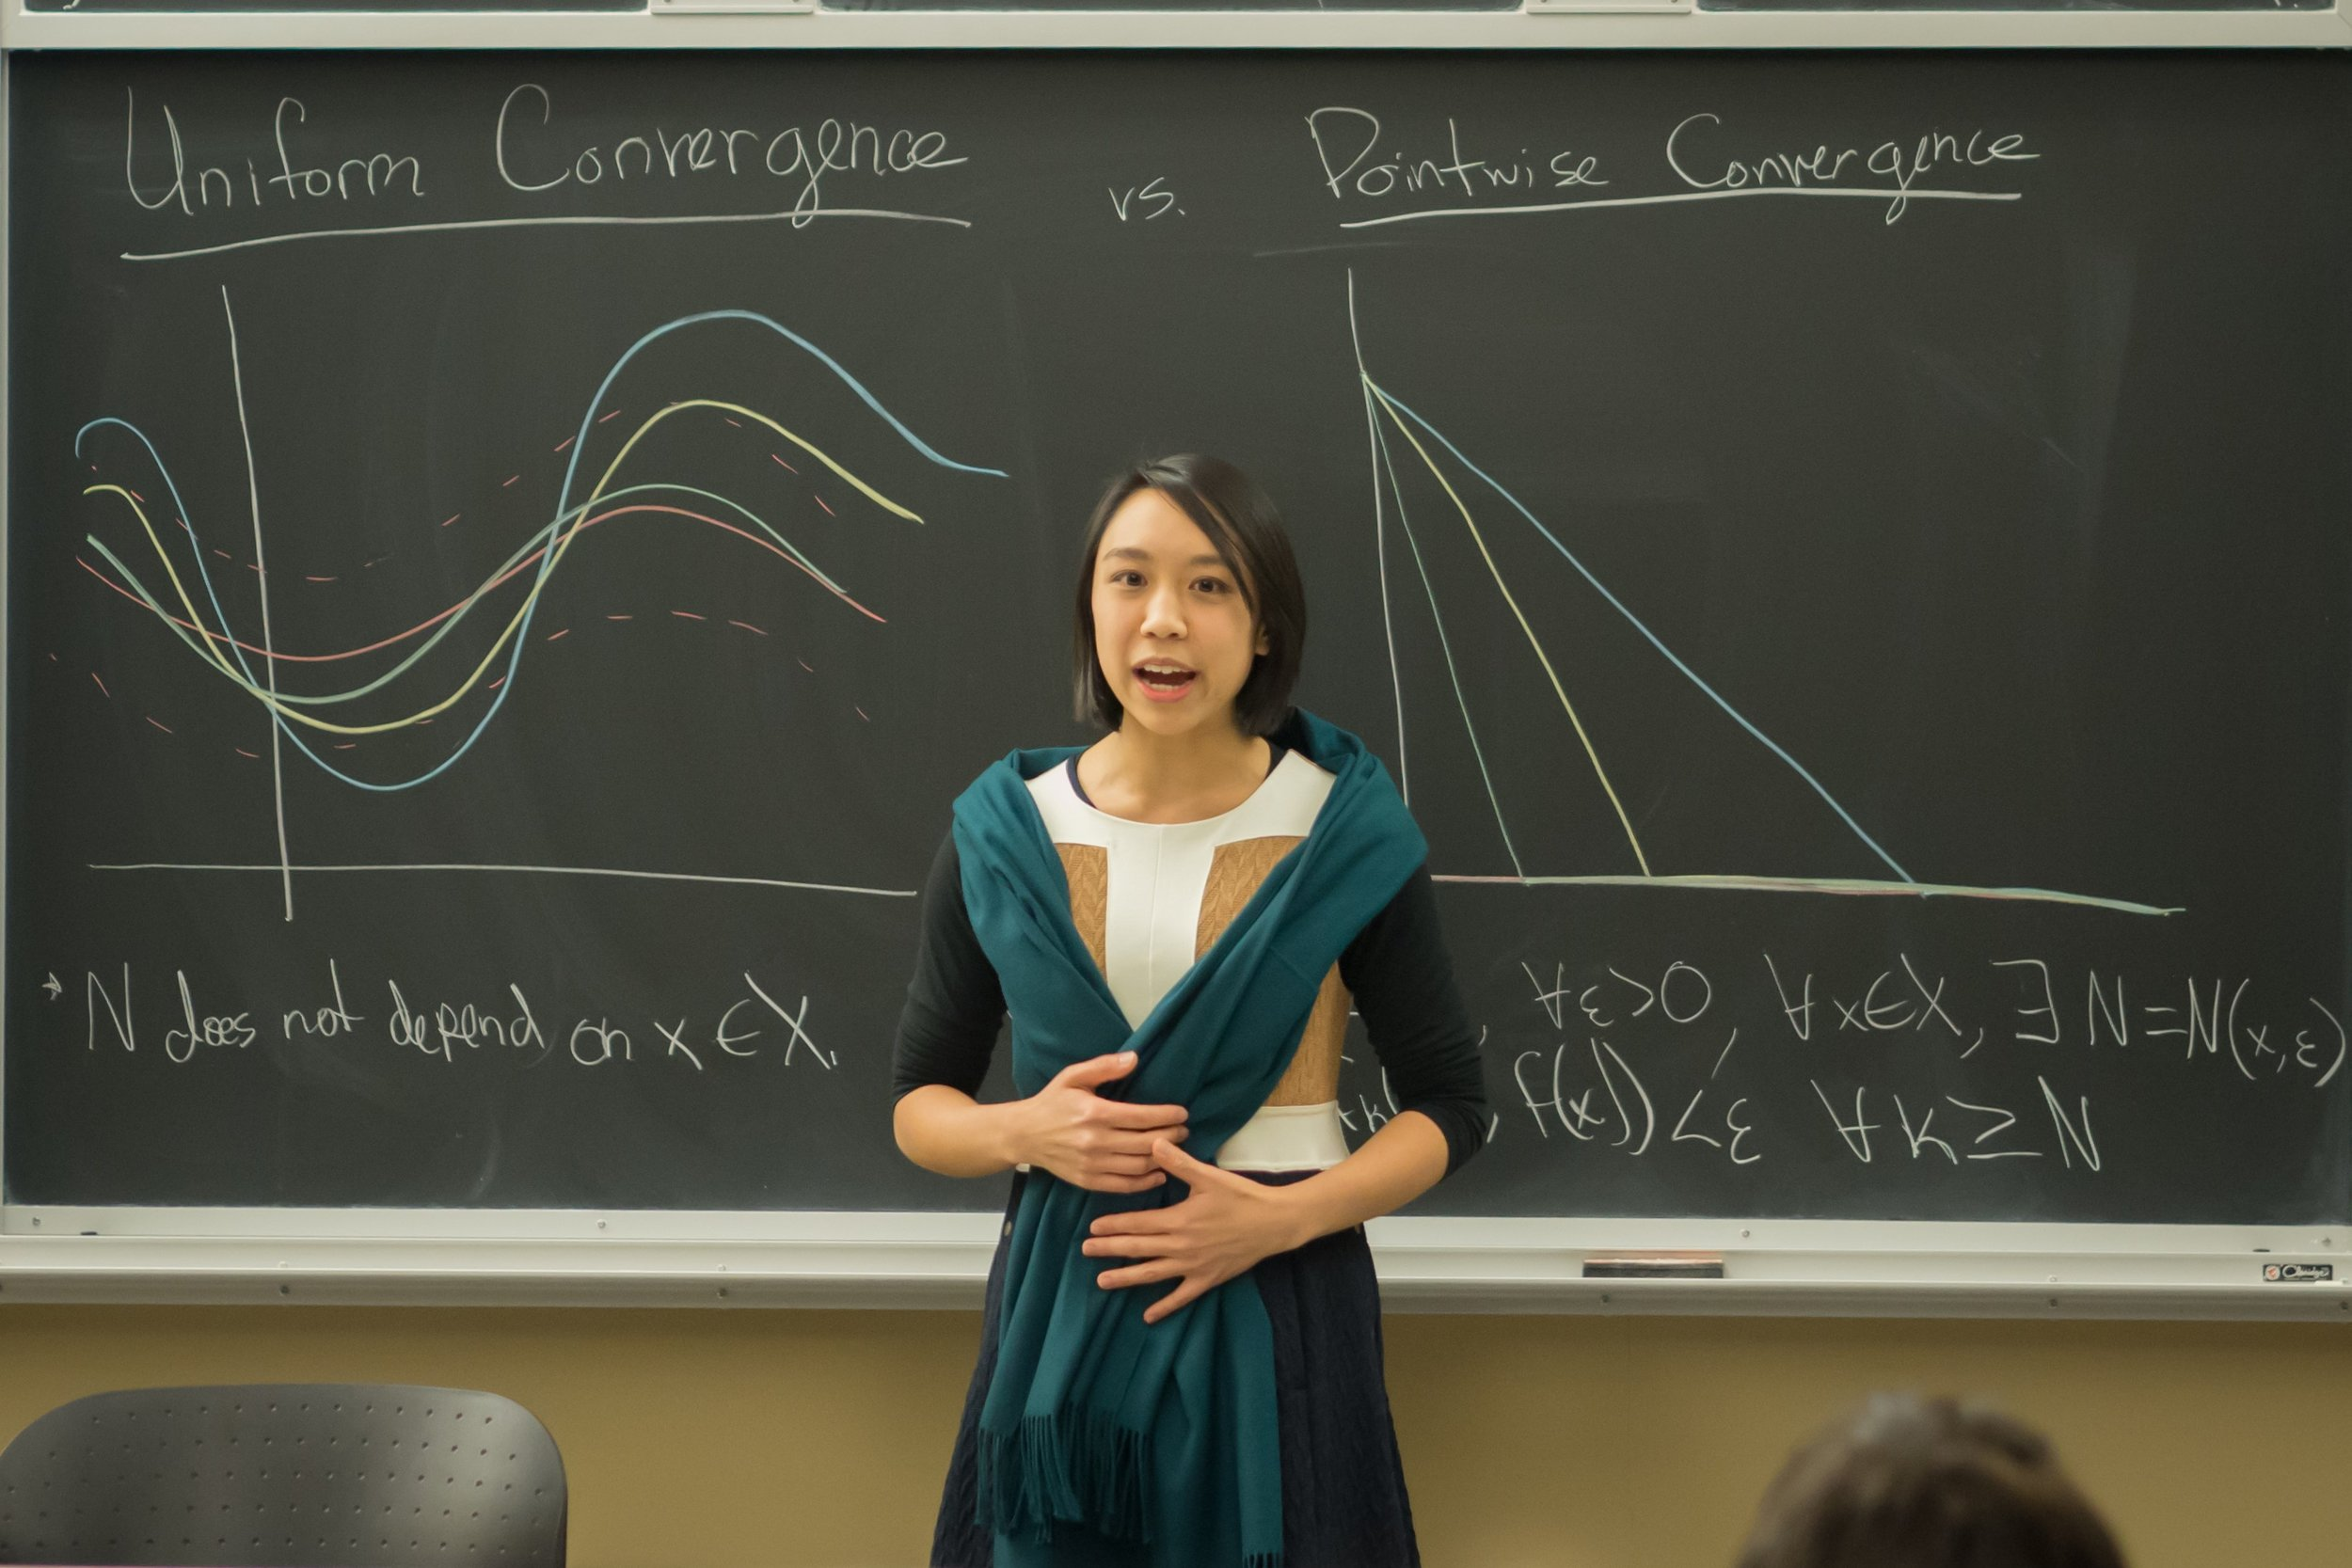 Uniform Convergence Yale-39.jpg